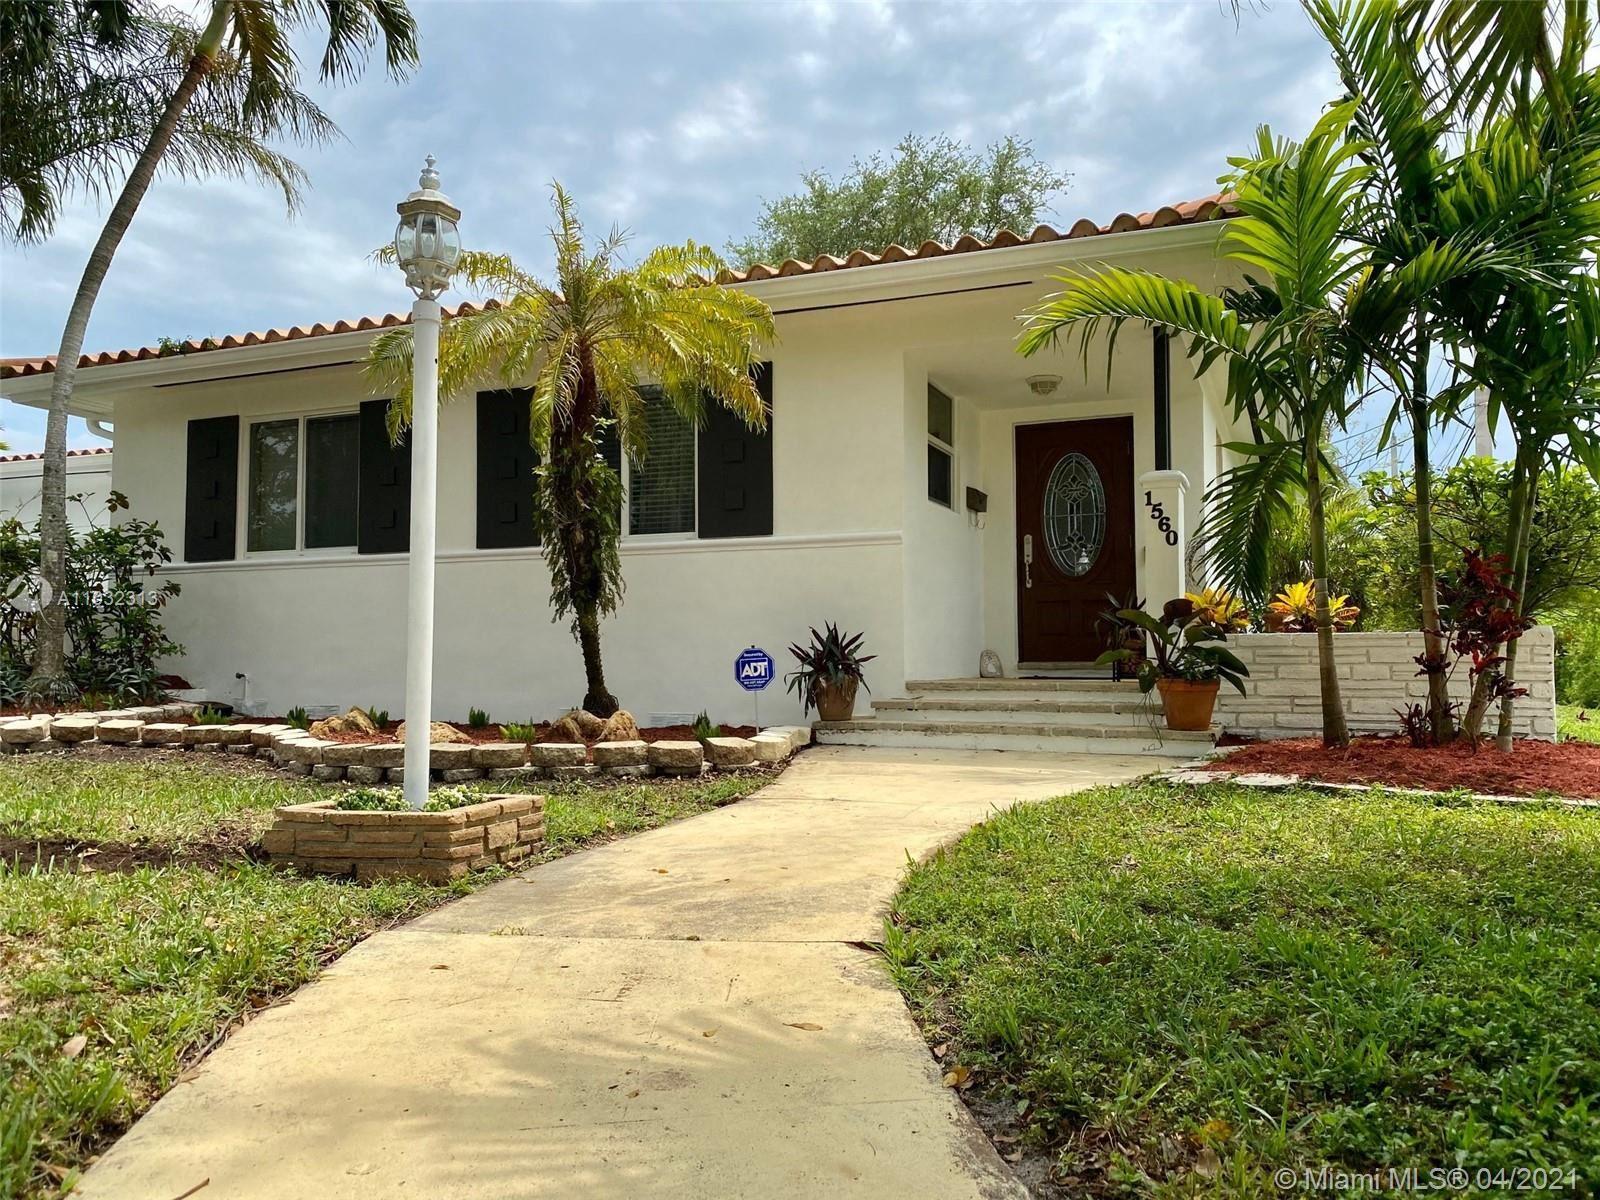 1560 Catalonia Ave, Coral Gables, FL 33134 - #: A11032313